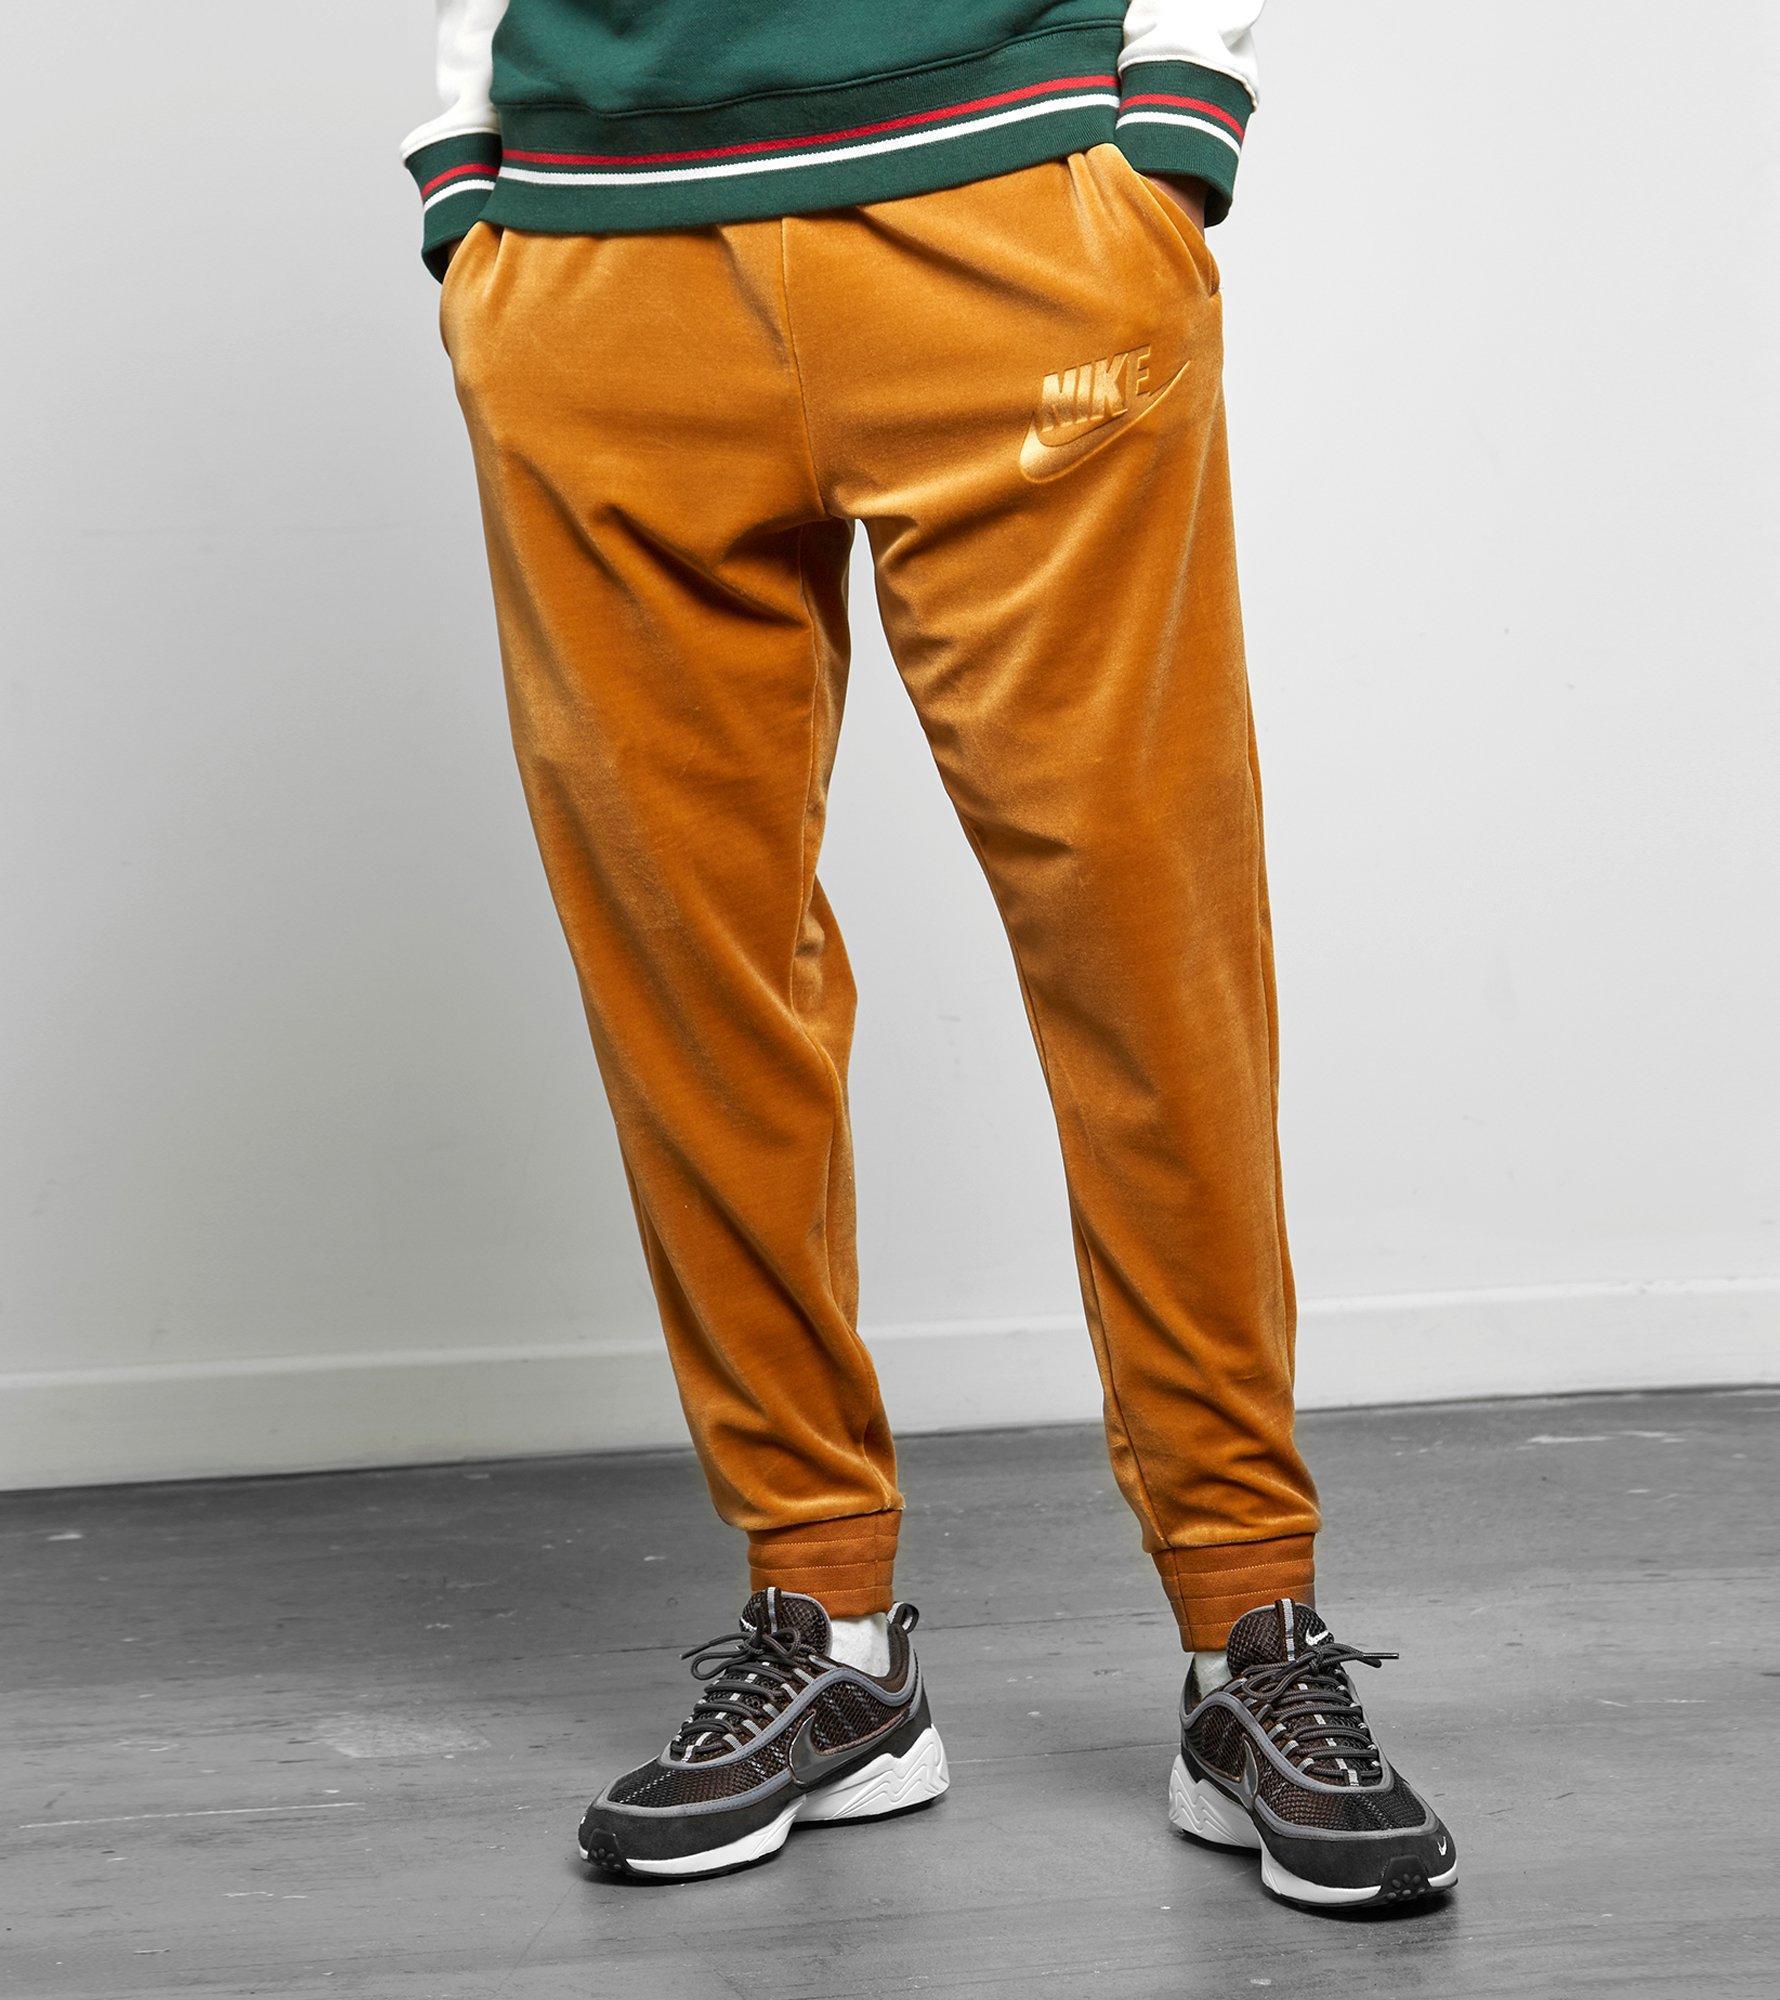 96b8d52bc20 Nike Plush Velour Pant in Metallic for Men - Lyst